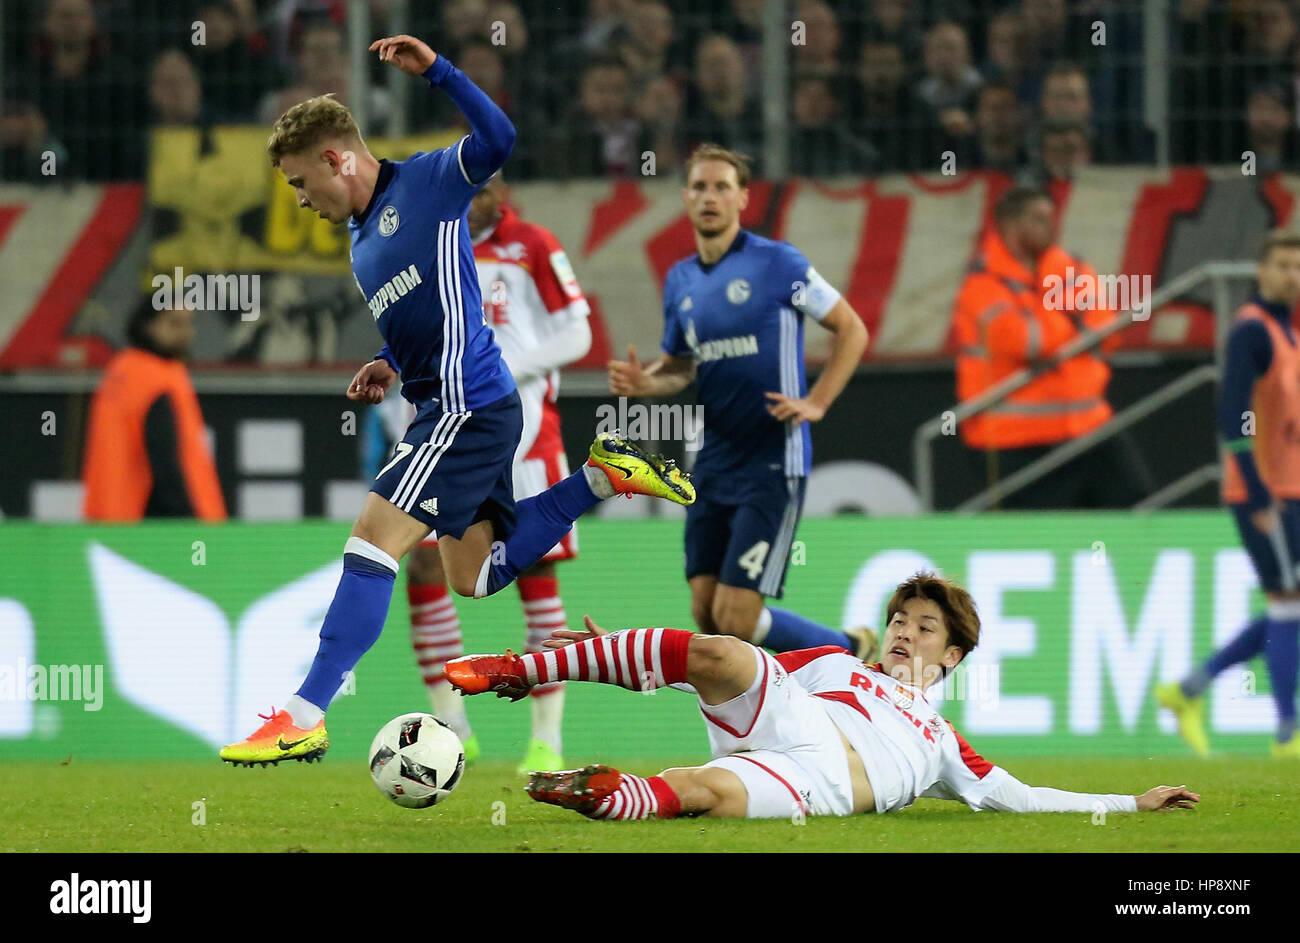 Cologne, Germany, February 19, 2017, Bundesliga matchday 21, 1. FC Koeln - FC Schalke 04:  Tackling Max Meyer (Schalke, - Stock Image